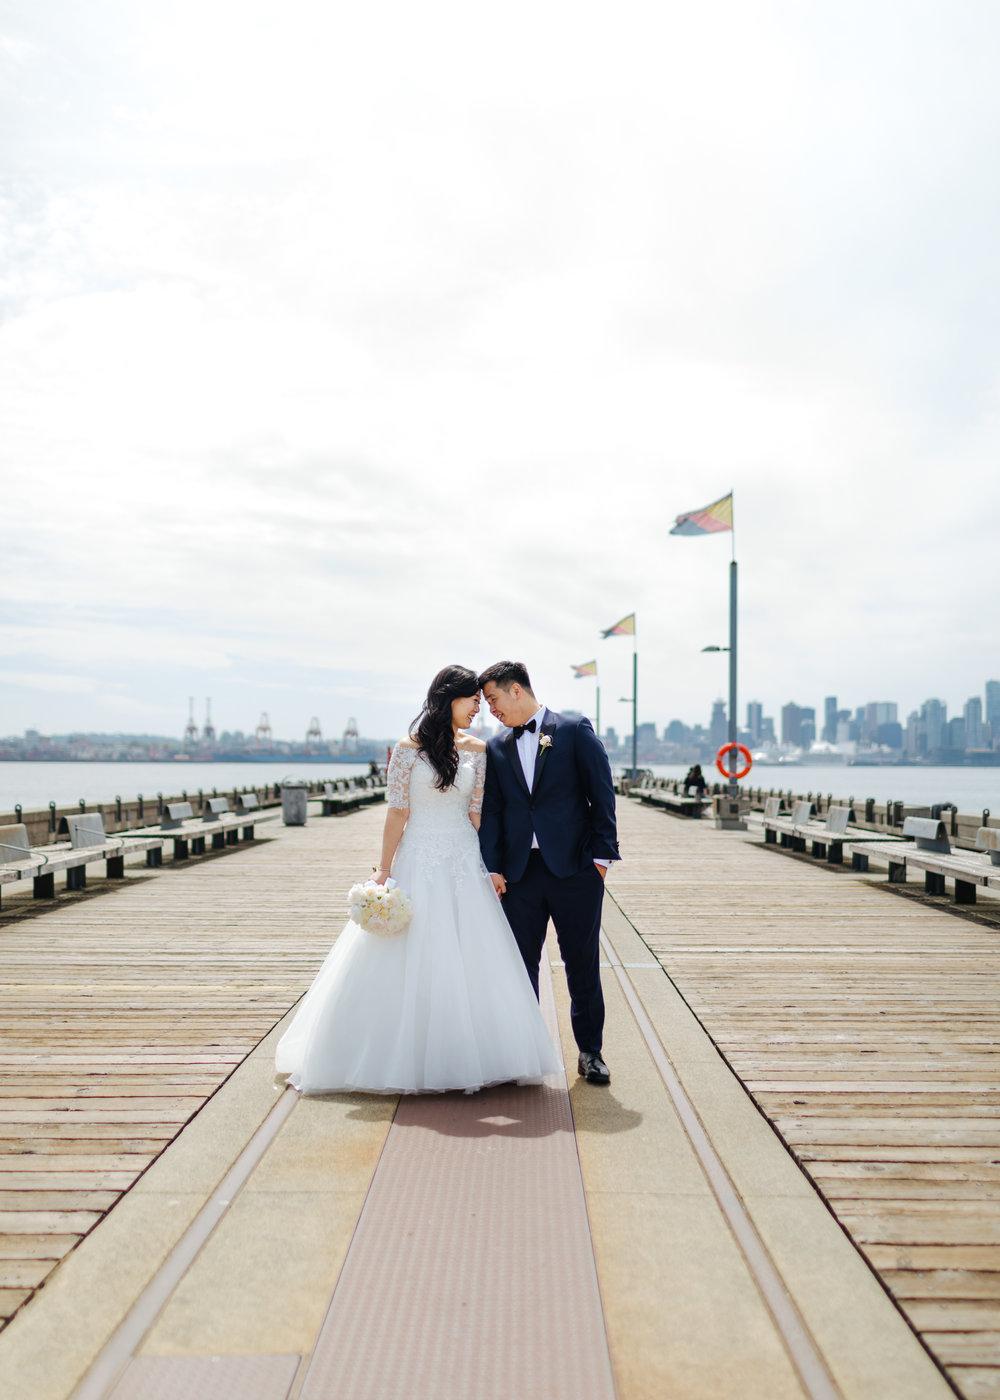 herastudios_wedding_irina_orgilsaikhan_hera_selects-26.jpg